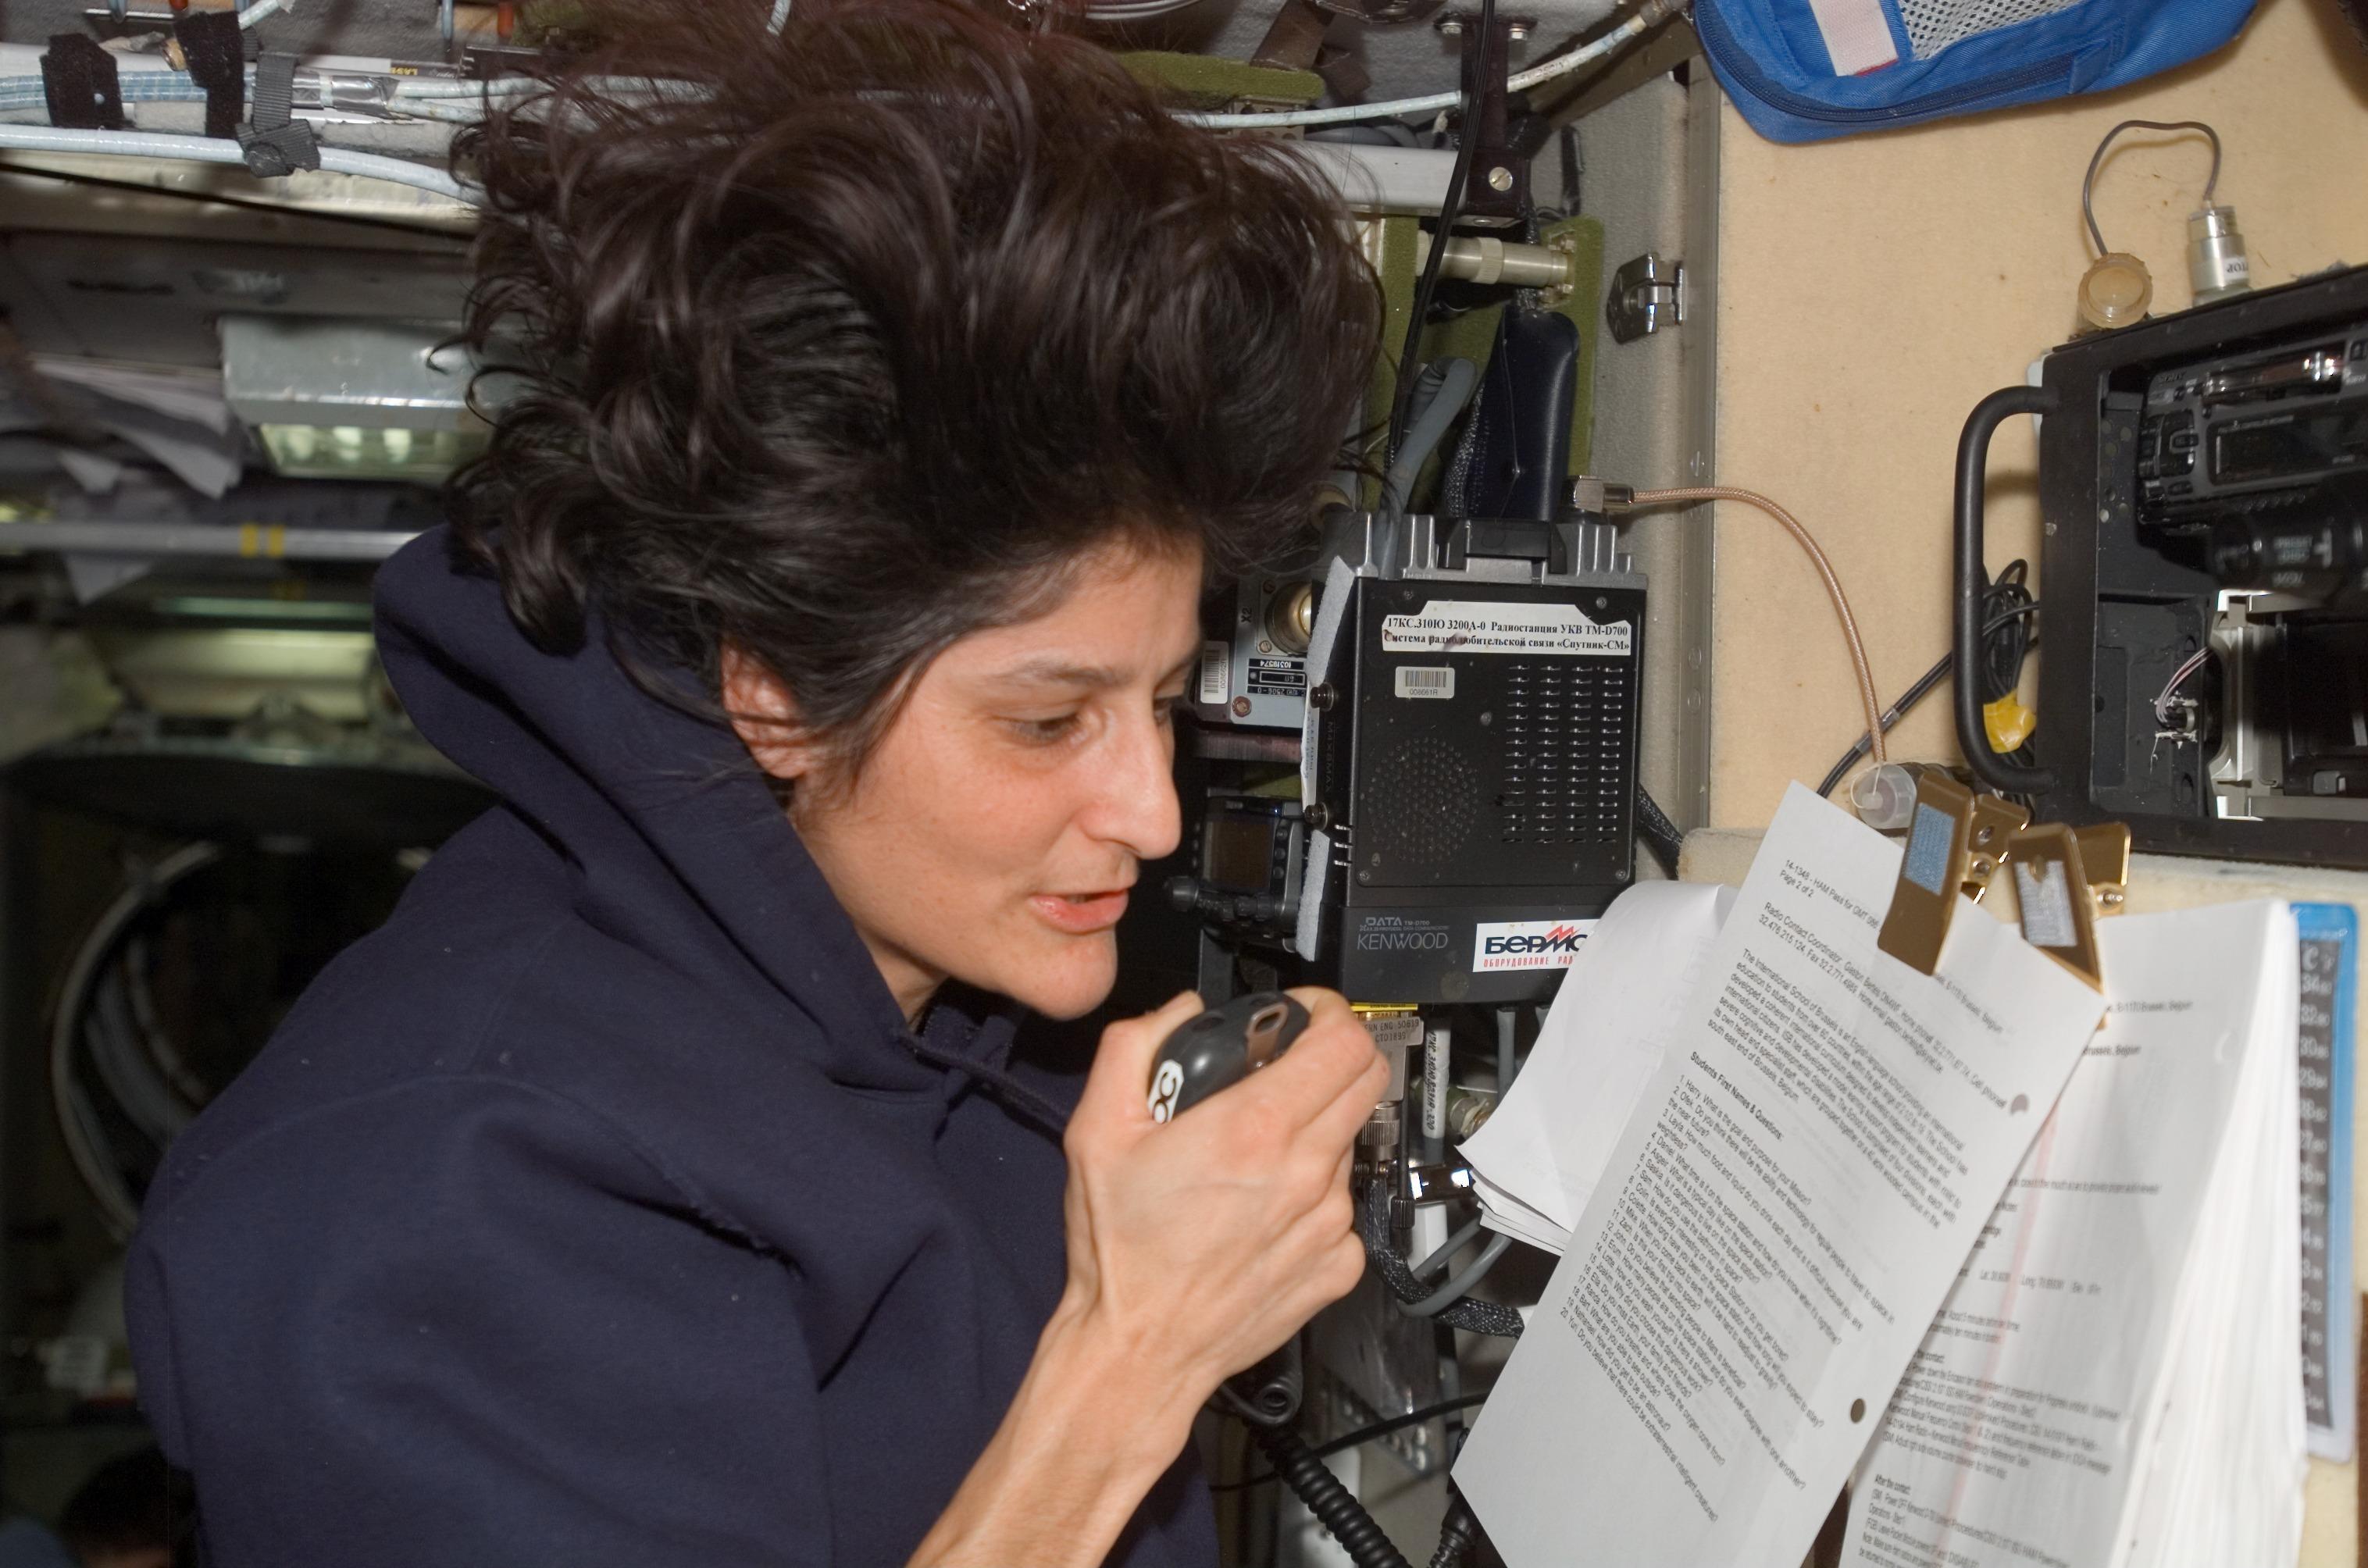 Mast Girl Wallpaper Nasa International Space Station Ham Radio Also Known